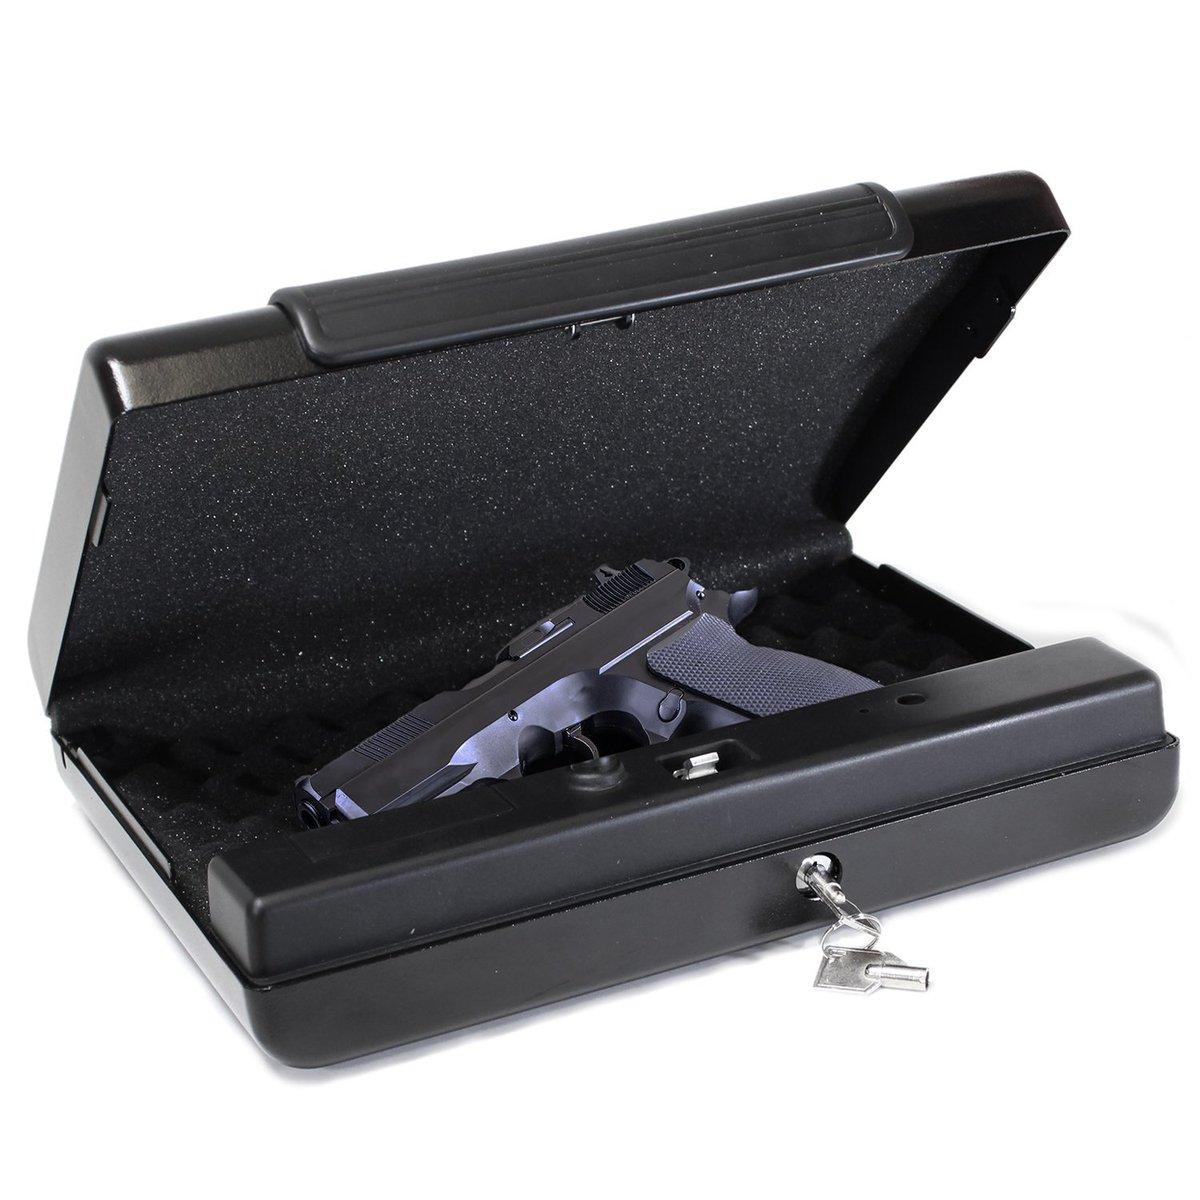 First Alert 5200DF Portable Handgun or Pistol Safe  http:// amzn.to/1Pjb9TG  &nbsp;    #nra #gunsafety #guncontrol<br>http://pic.twitter.com/qzqdNJ5yN4